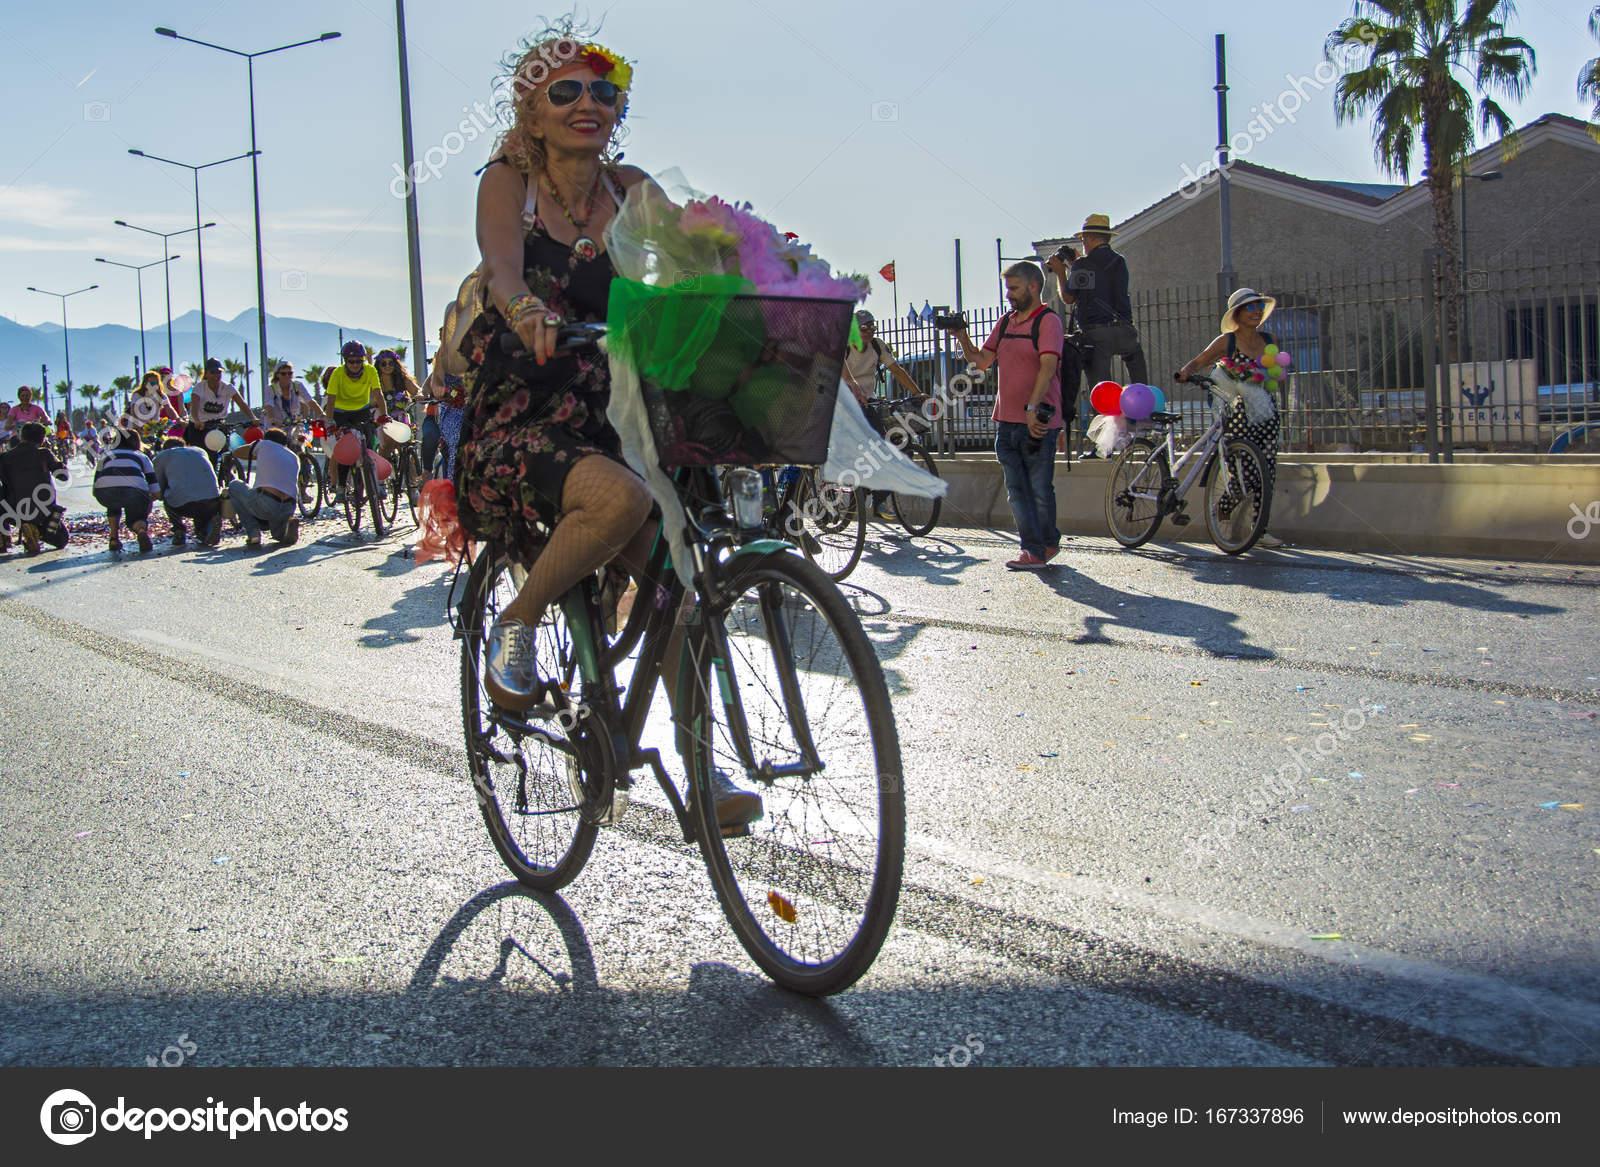 09 24 2017 Konak Izmir Turkey Izmir Fancy Women Cycling Festival Stock Editorial Photo C Muratti6868 167337896